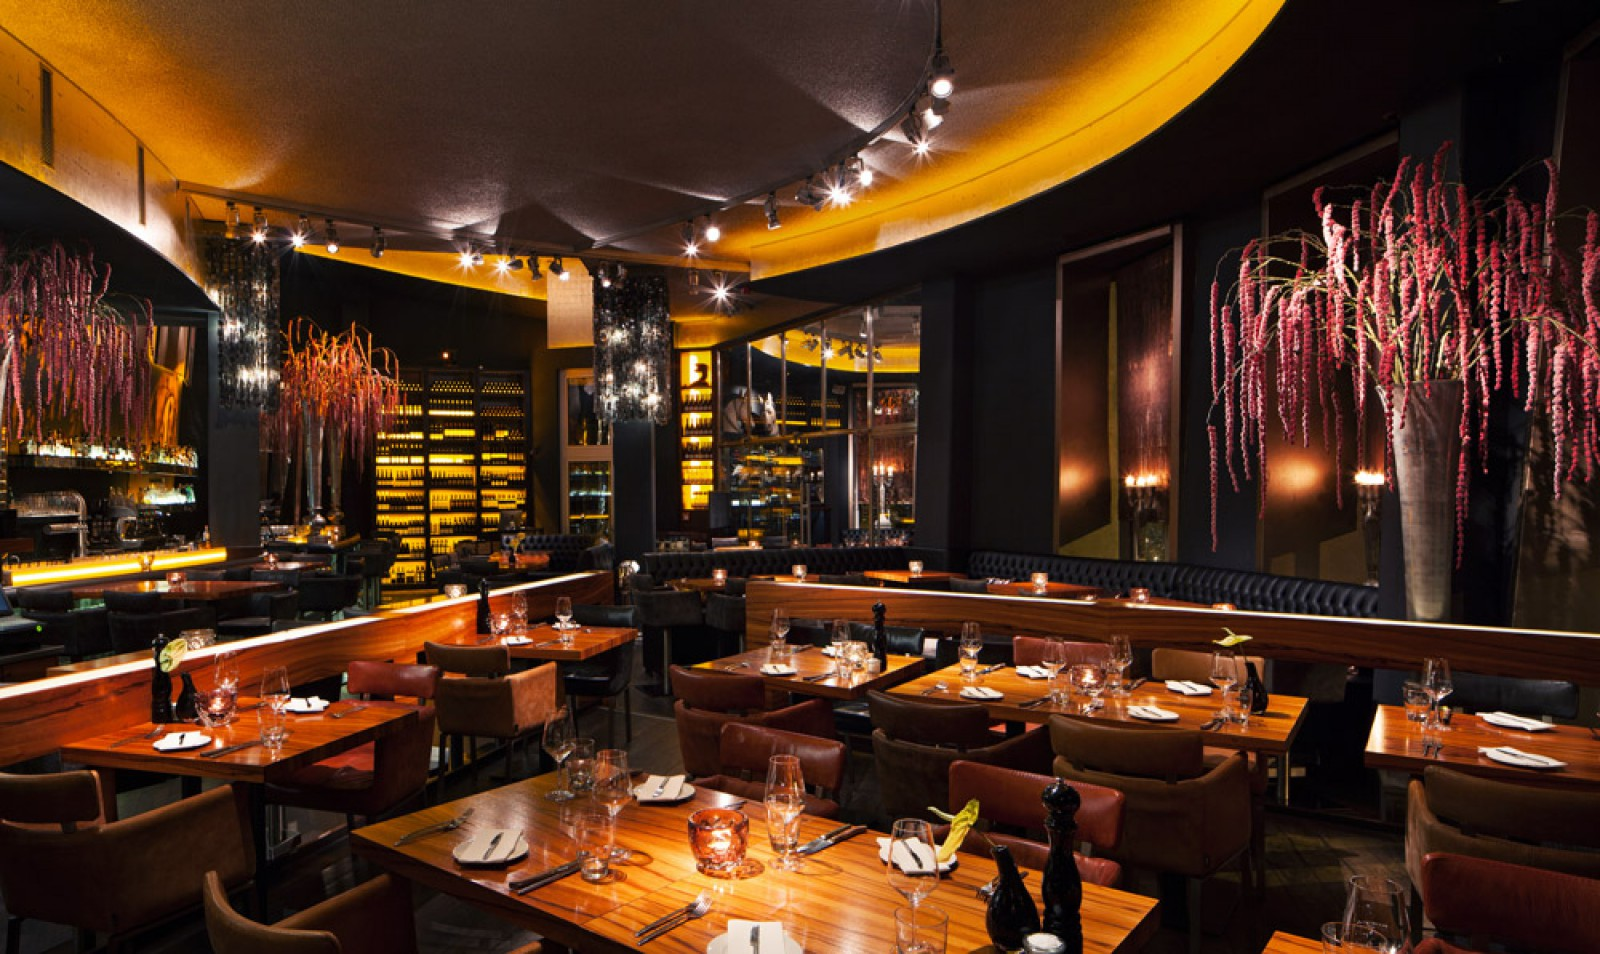 Restaurant rocca im gehryaposs in d sseldorf for Restaurant la cuisine limoges